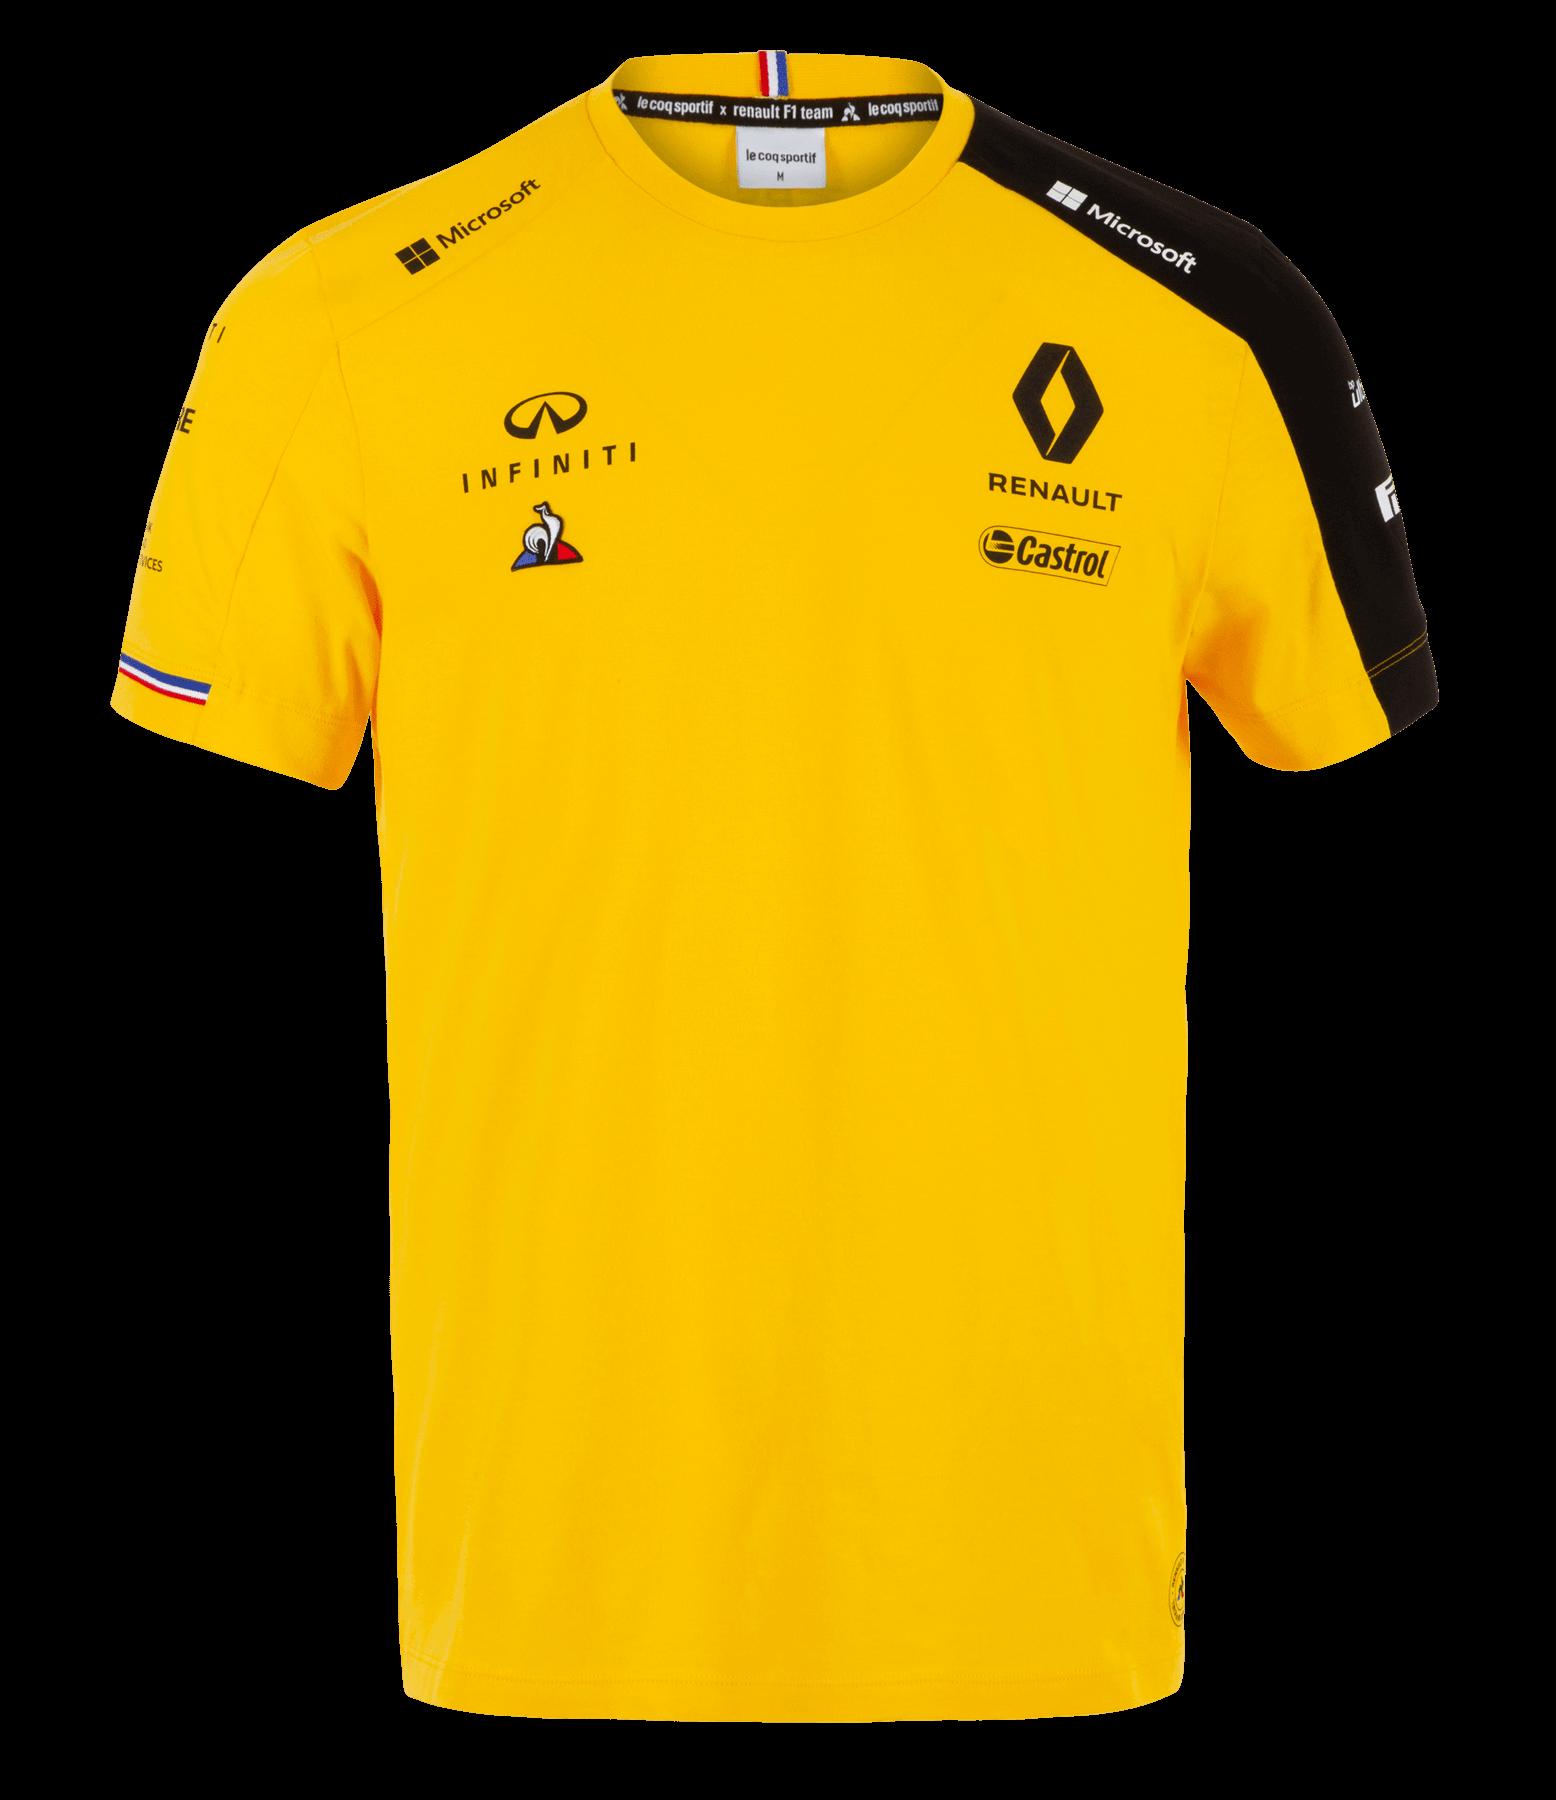 RENAULT F1® TEAM 2019 men's t-shirt - yellow size M